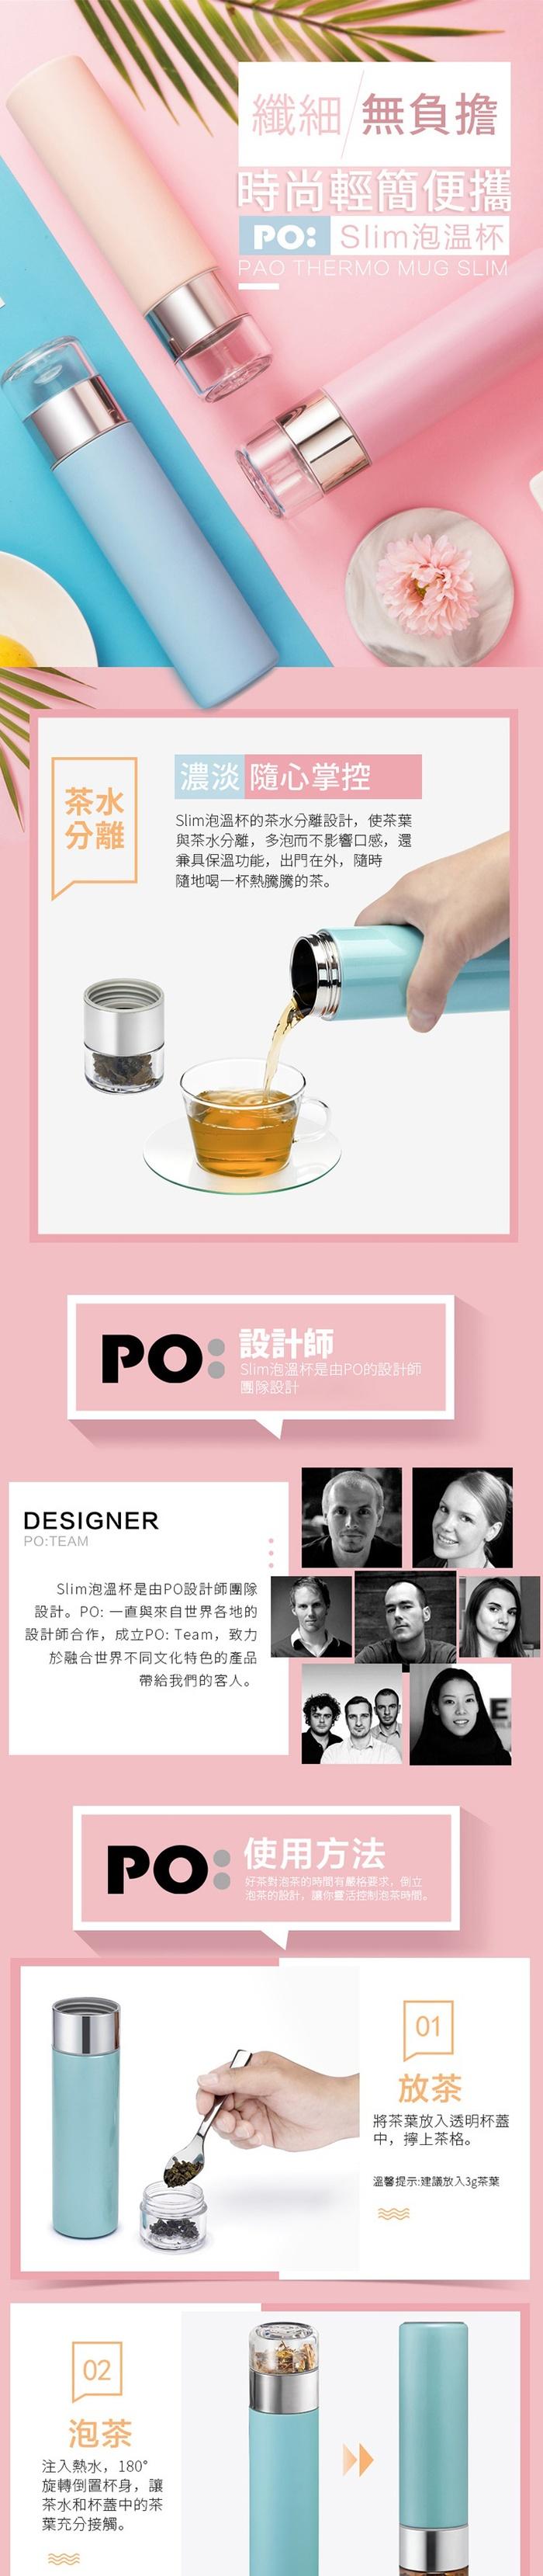 PO:Selected|丹麥攜帶式保溫杯240ml(母親節款-Amazing白)